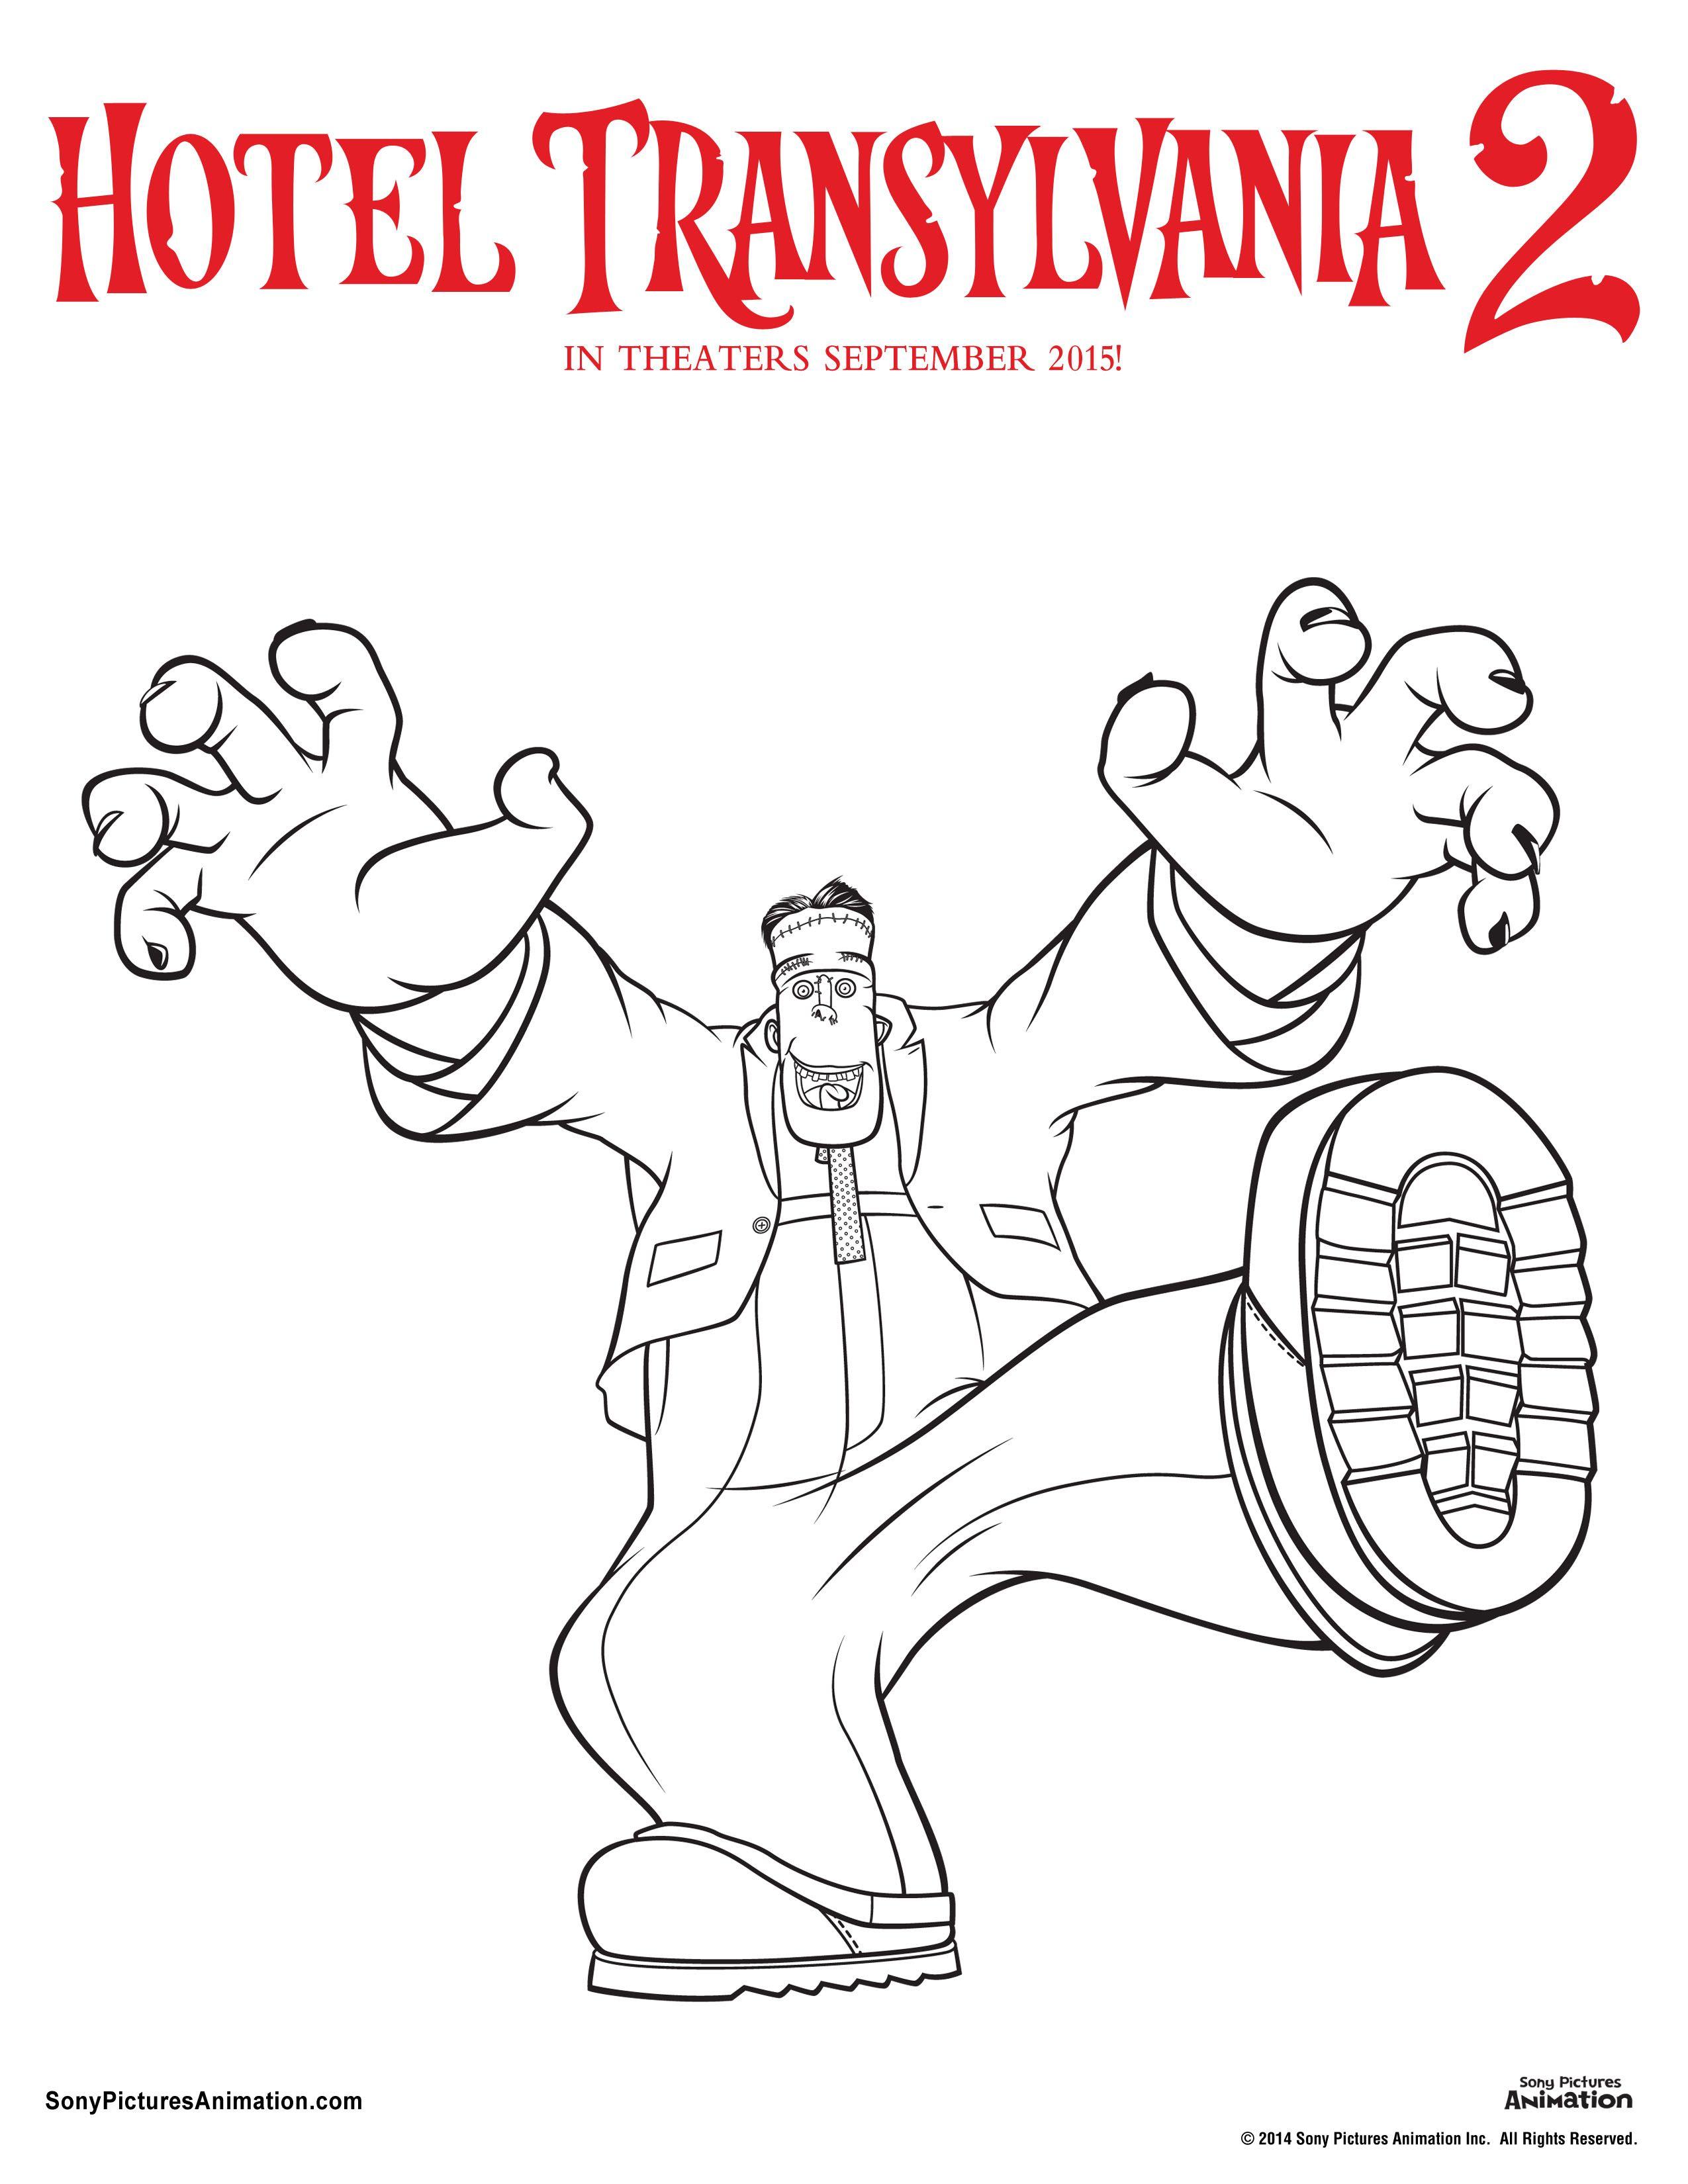 Hotel Transylvania 2 | My Babies: Entertainment | Pinterest ...